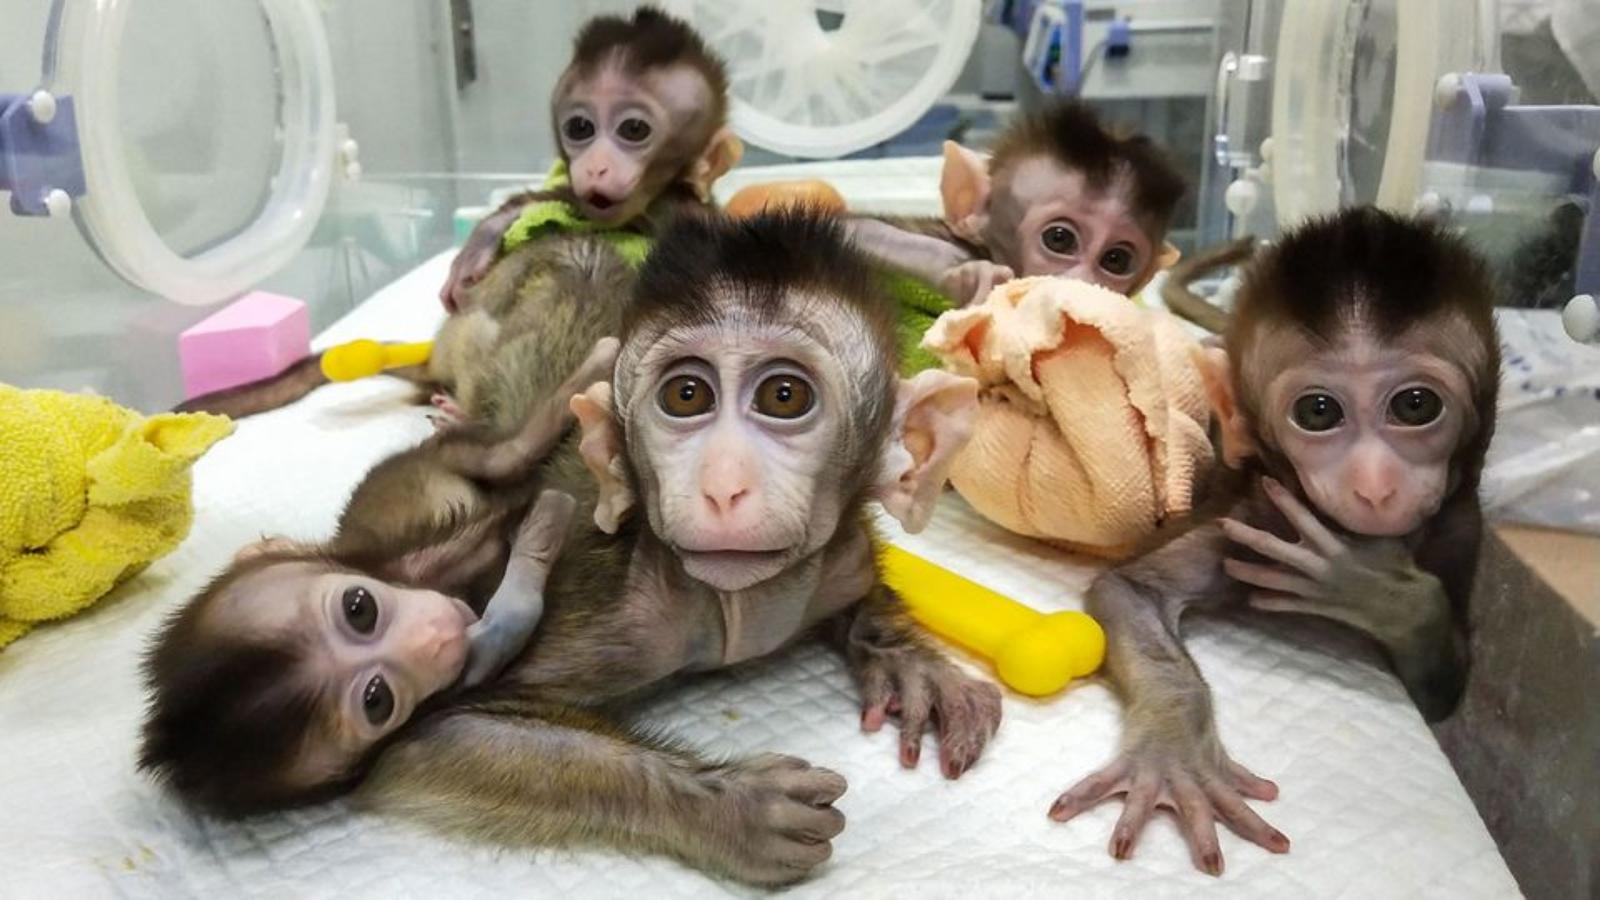 ma_0802_Crispr_animal_monkeys_1280x720-opt